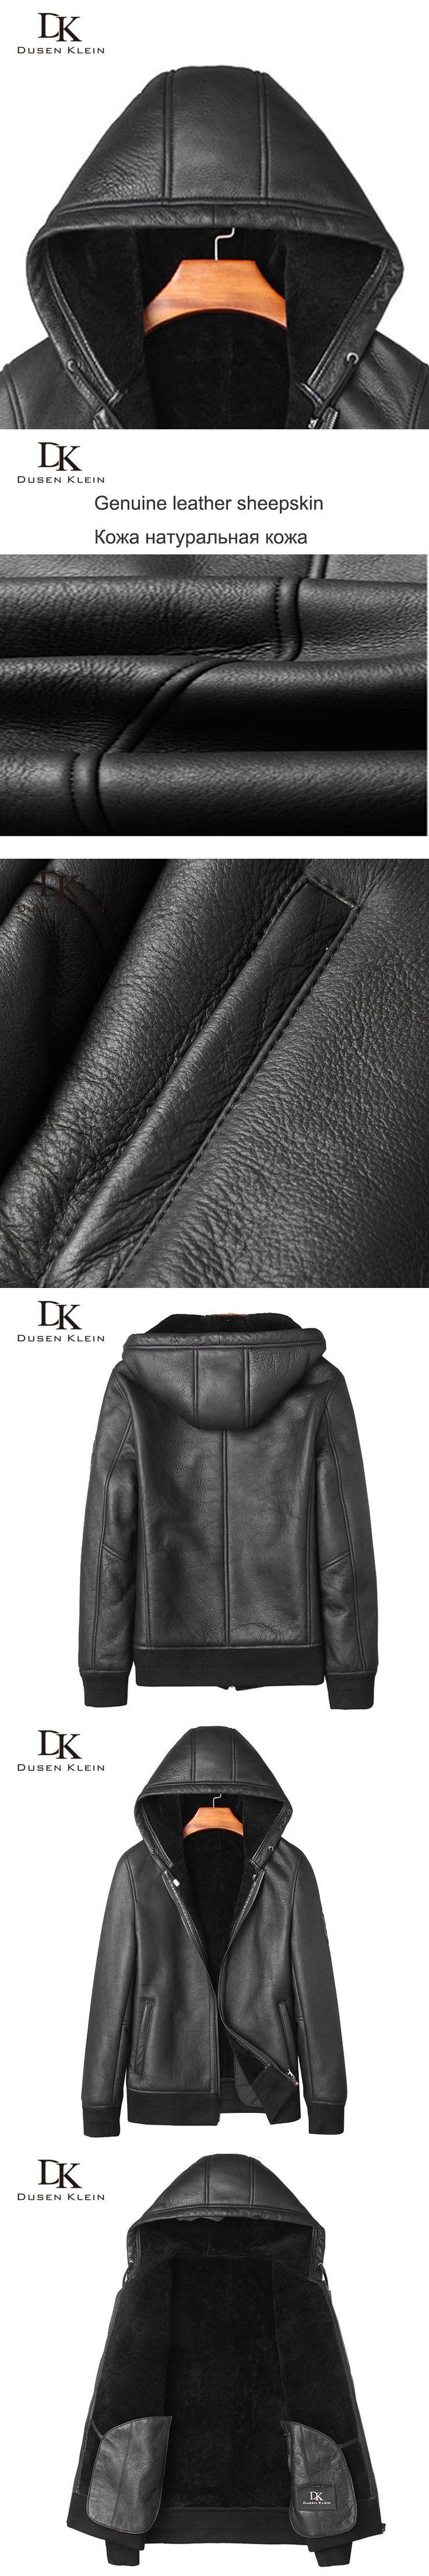 Winter Leather coats short Men Hooded wool shearling cloth Dusen Klein 2017 Nature sheepskin Luxury warm leather coat 71E1731